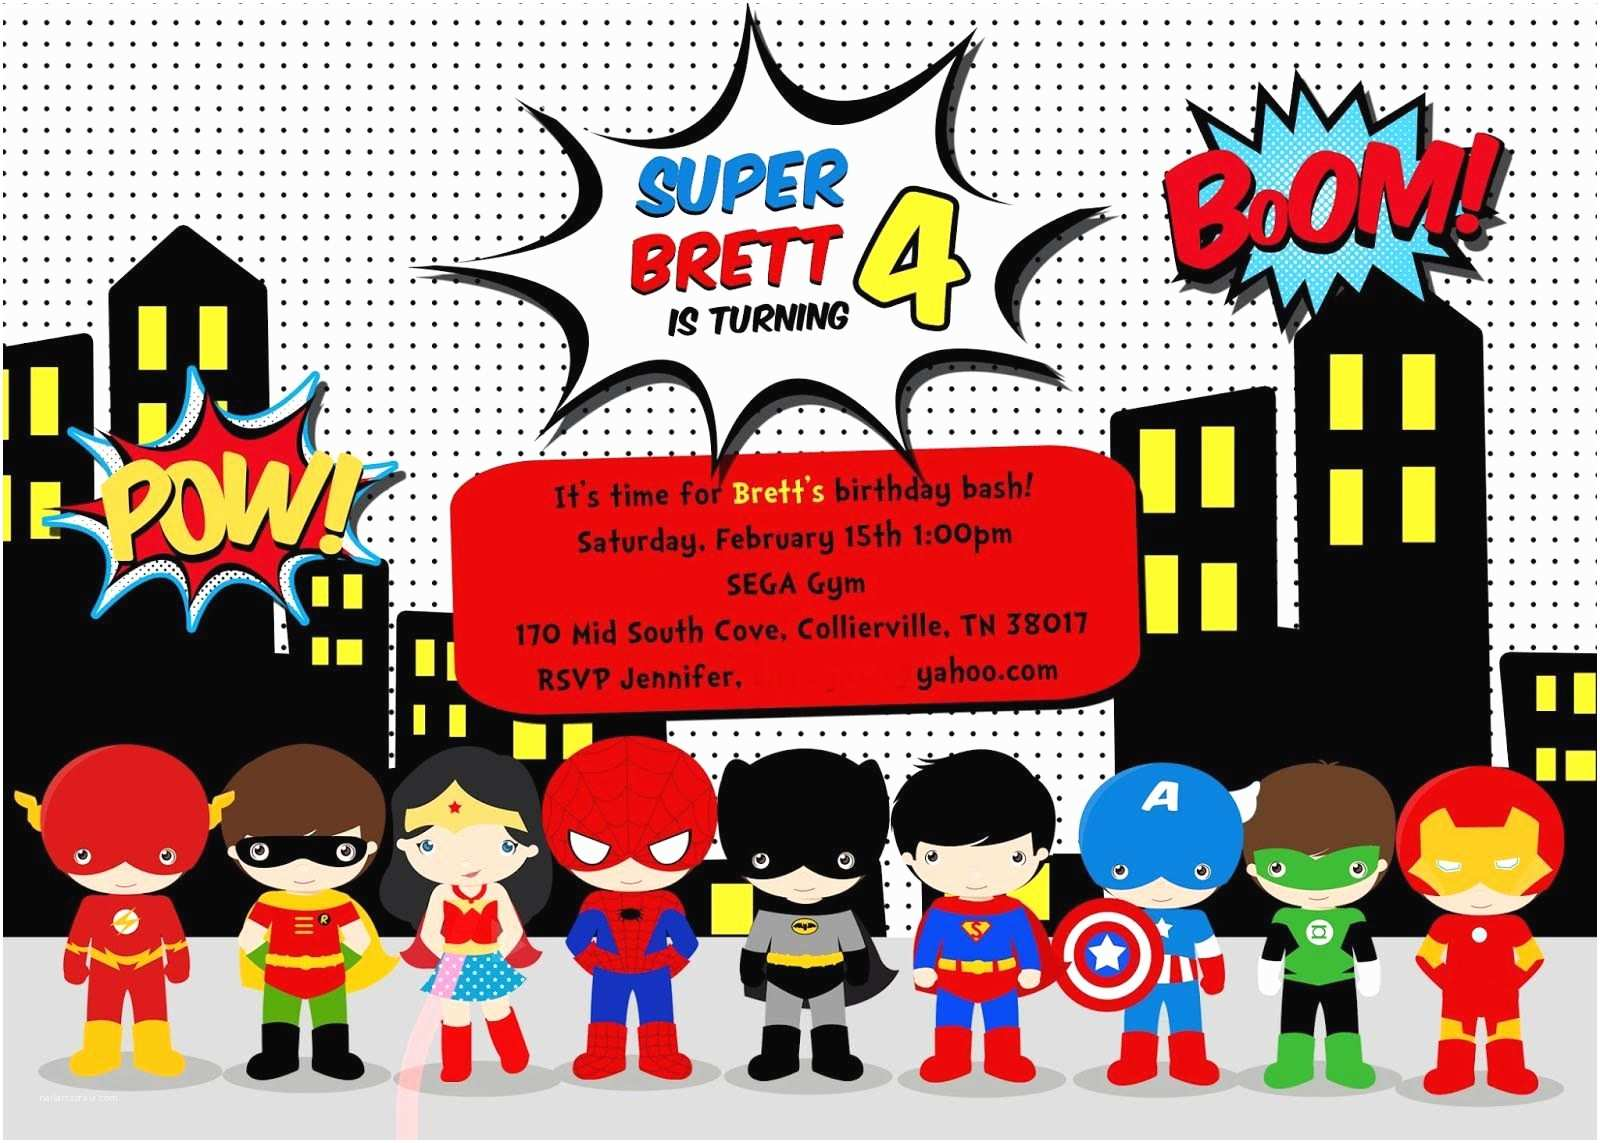 Superhero Birthday Party Invitations Free Superhero Birthday Party Invitation Templates